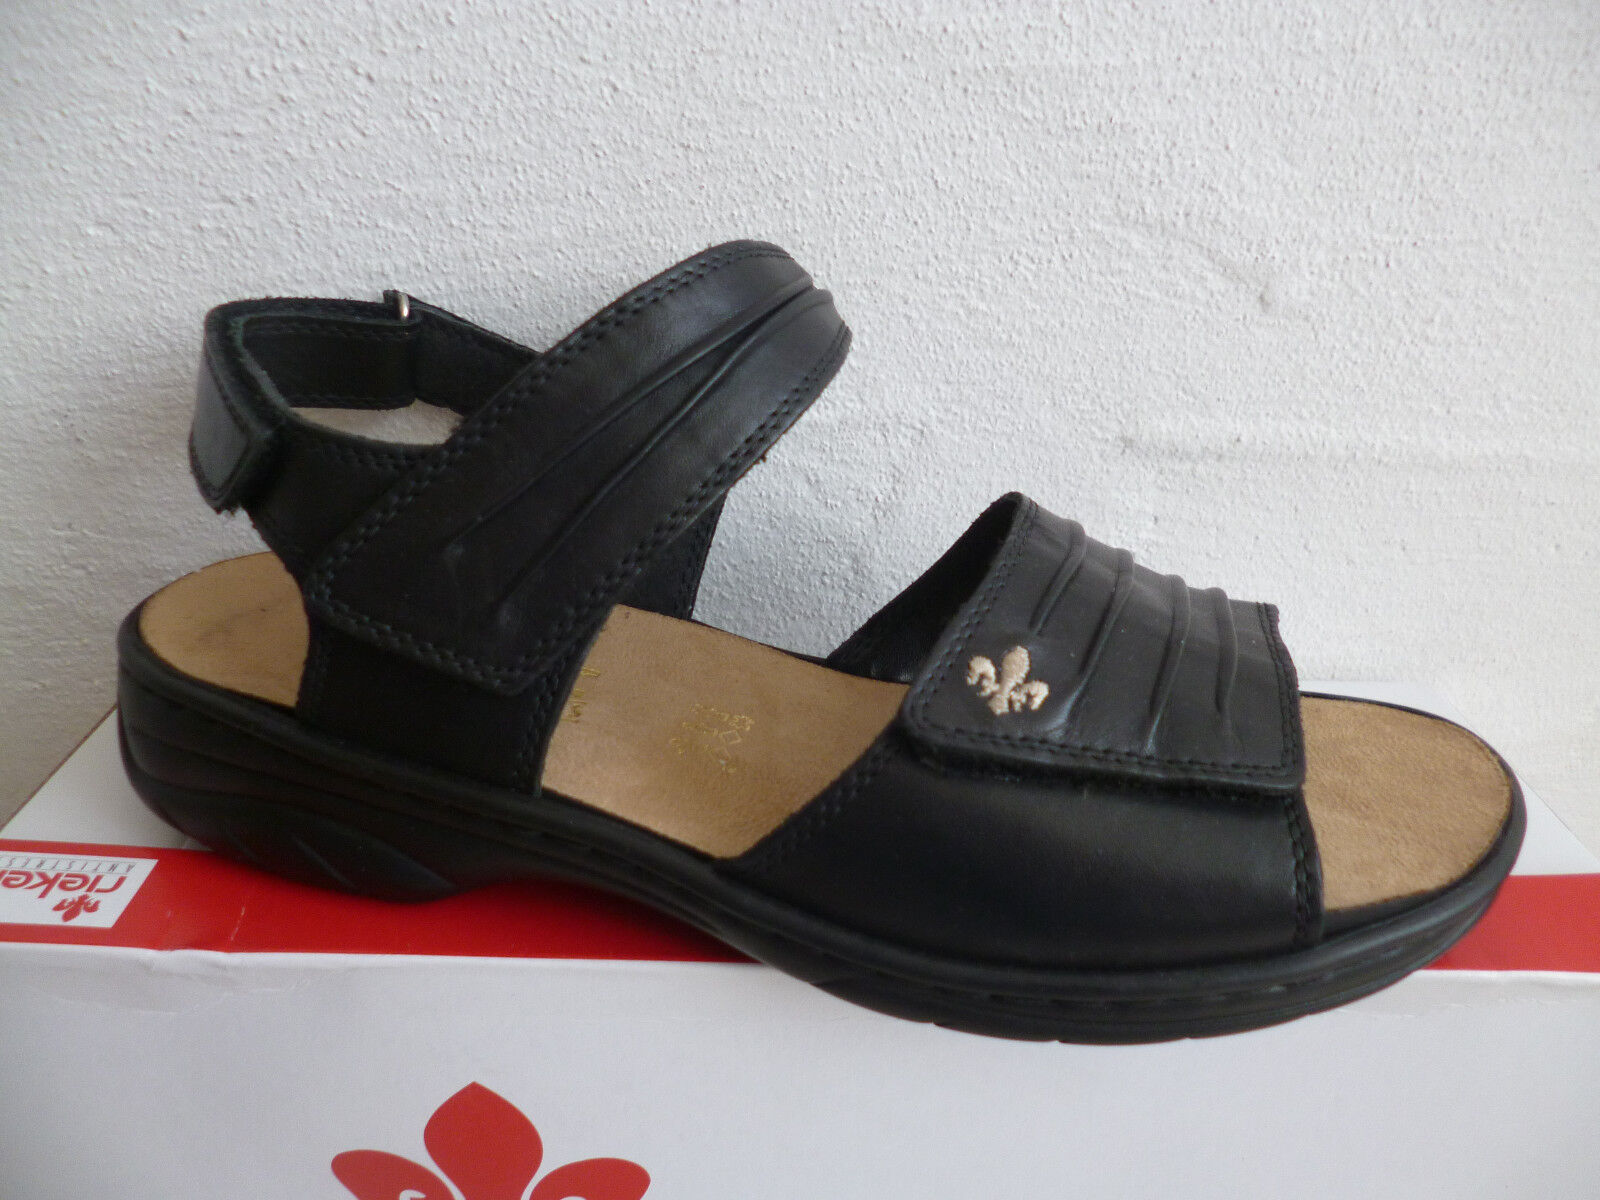 Rieker Damen 64560 Sandale Sandalette schwarz schwarz schwarz Leder NEU   2b0265